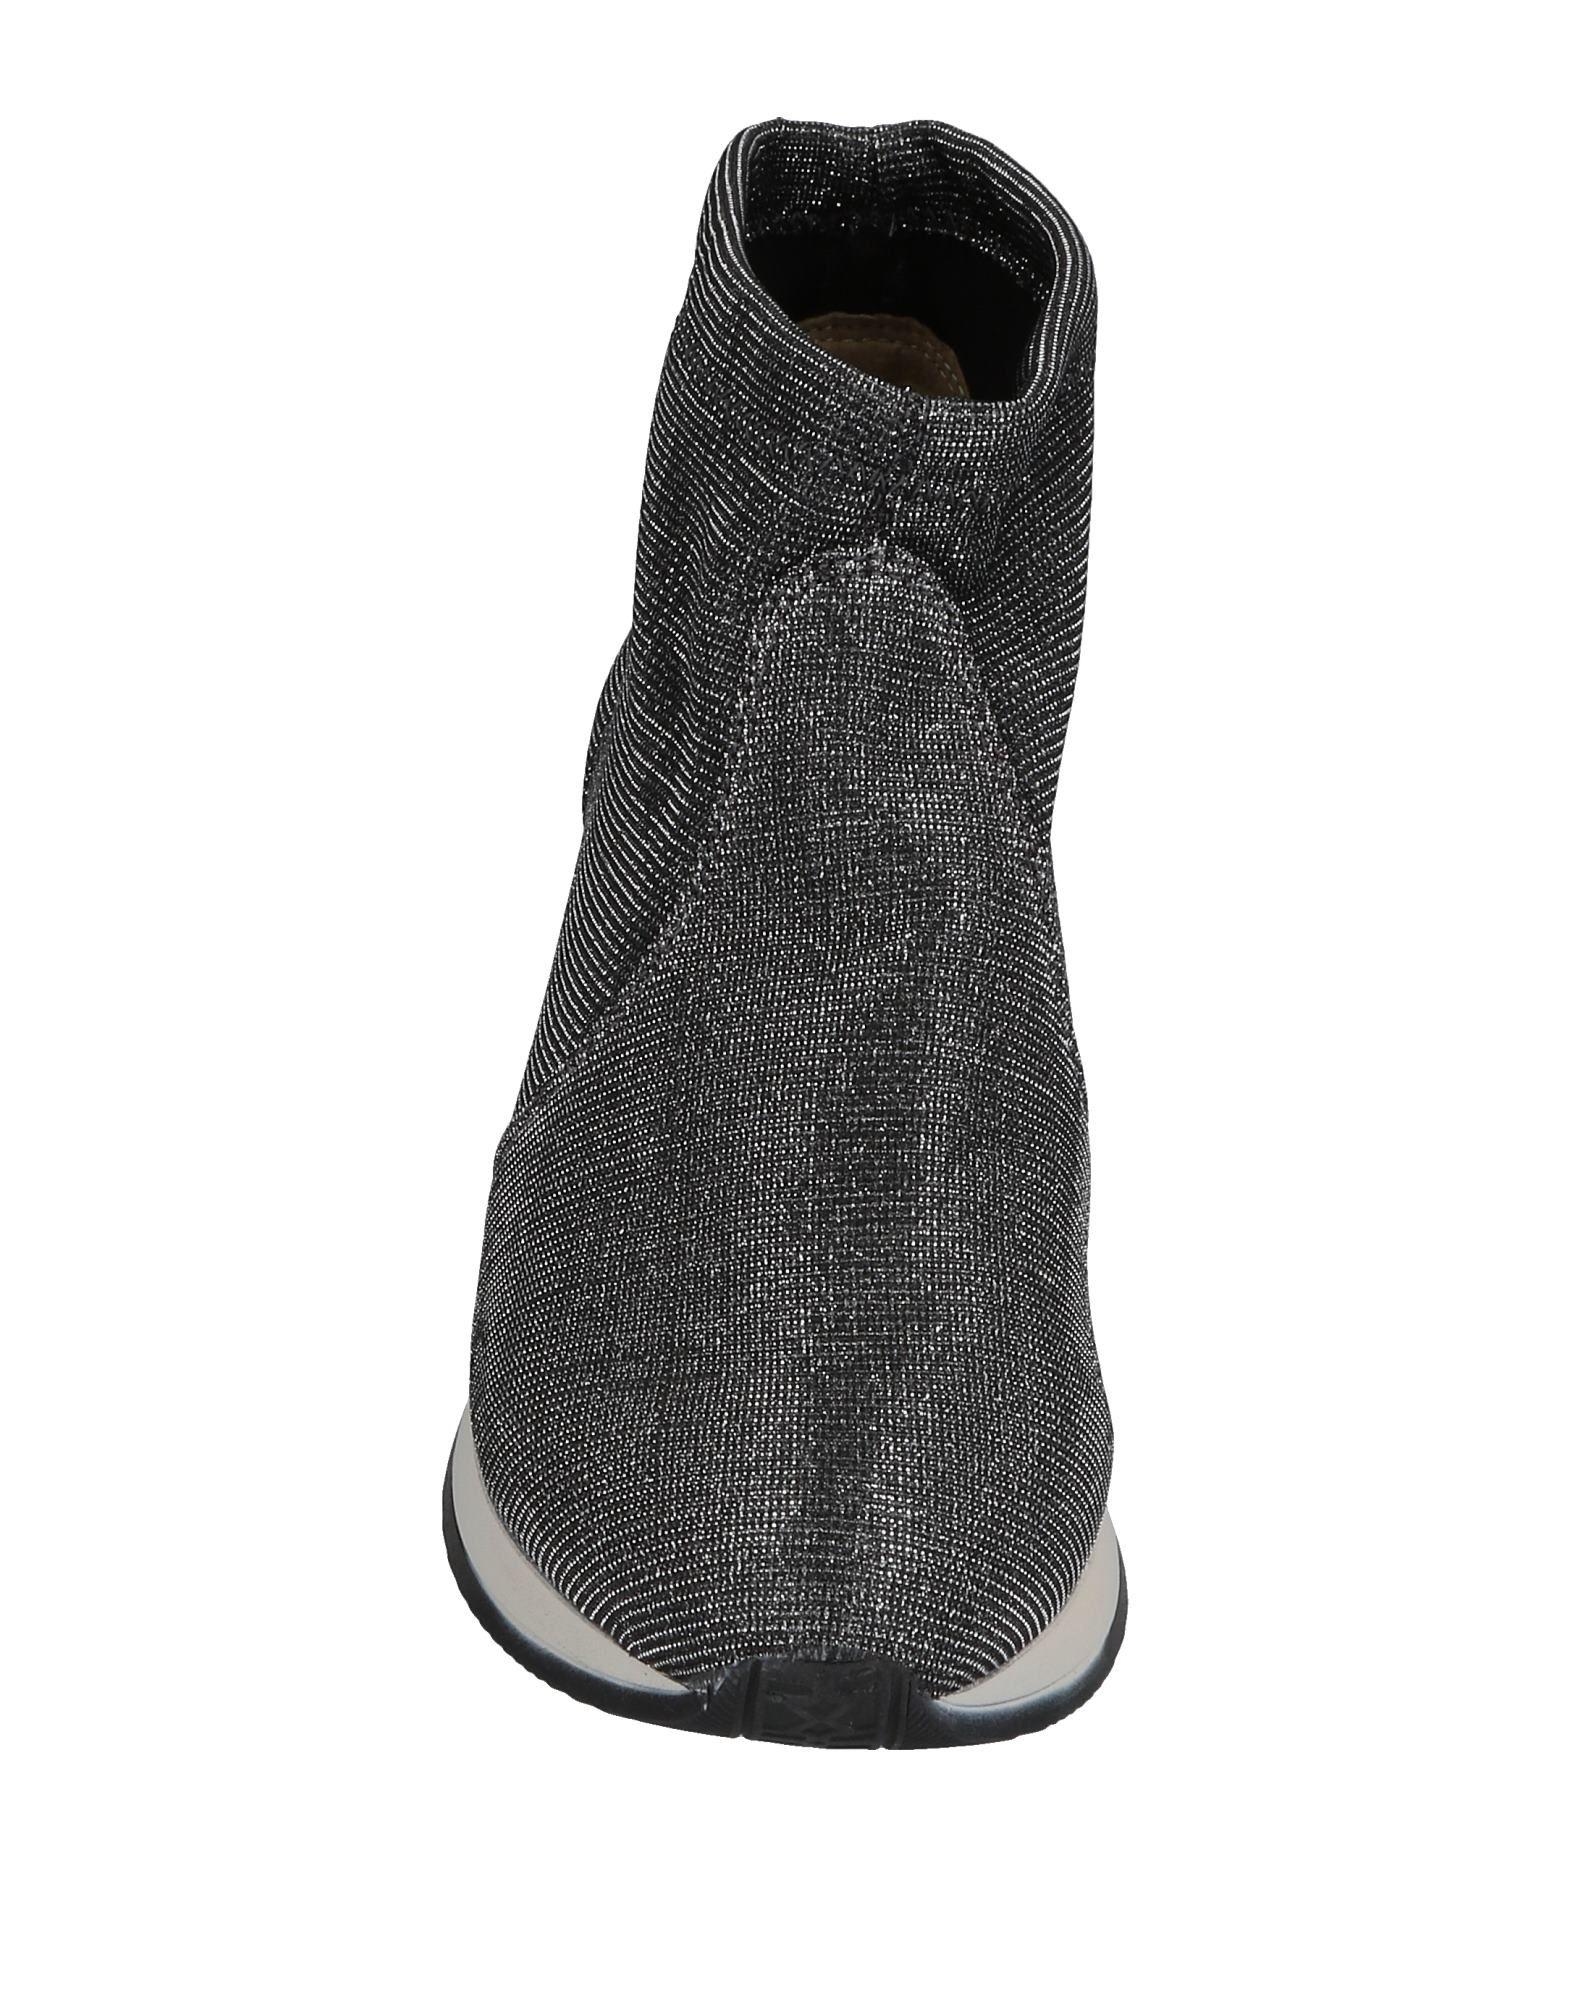 Nr Rapisardi Sneakers Damen  Qualität 11419252QI Gute Qualität  beliebte Schuhe d92219